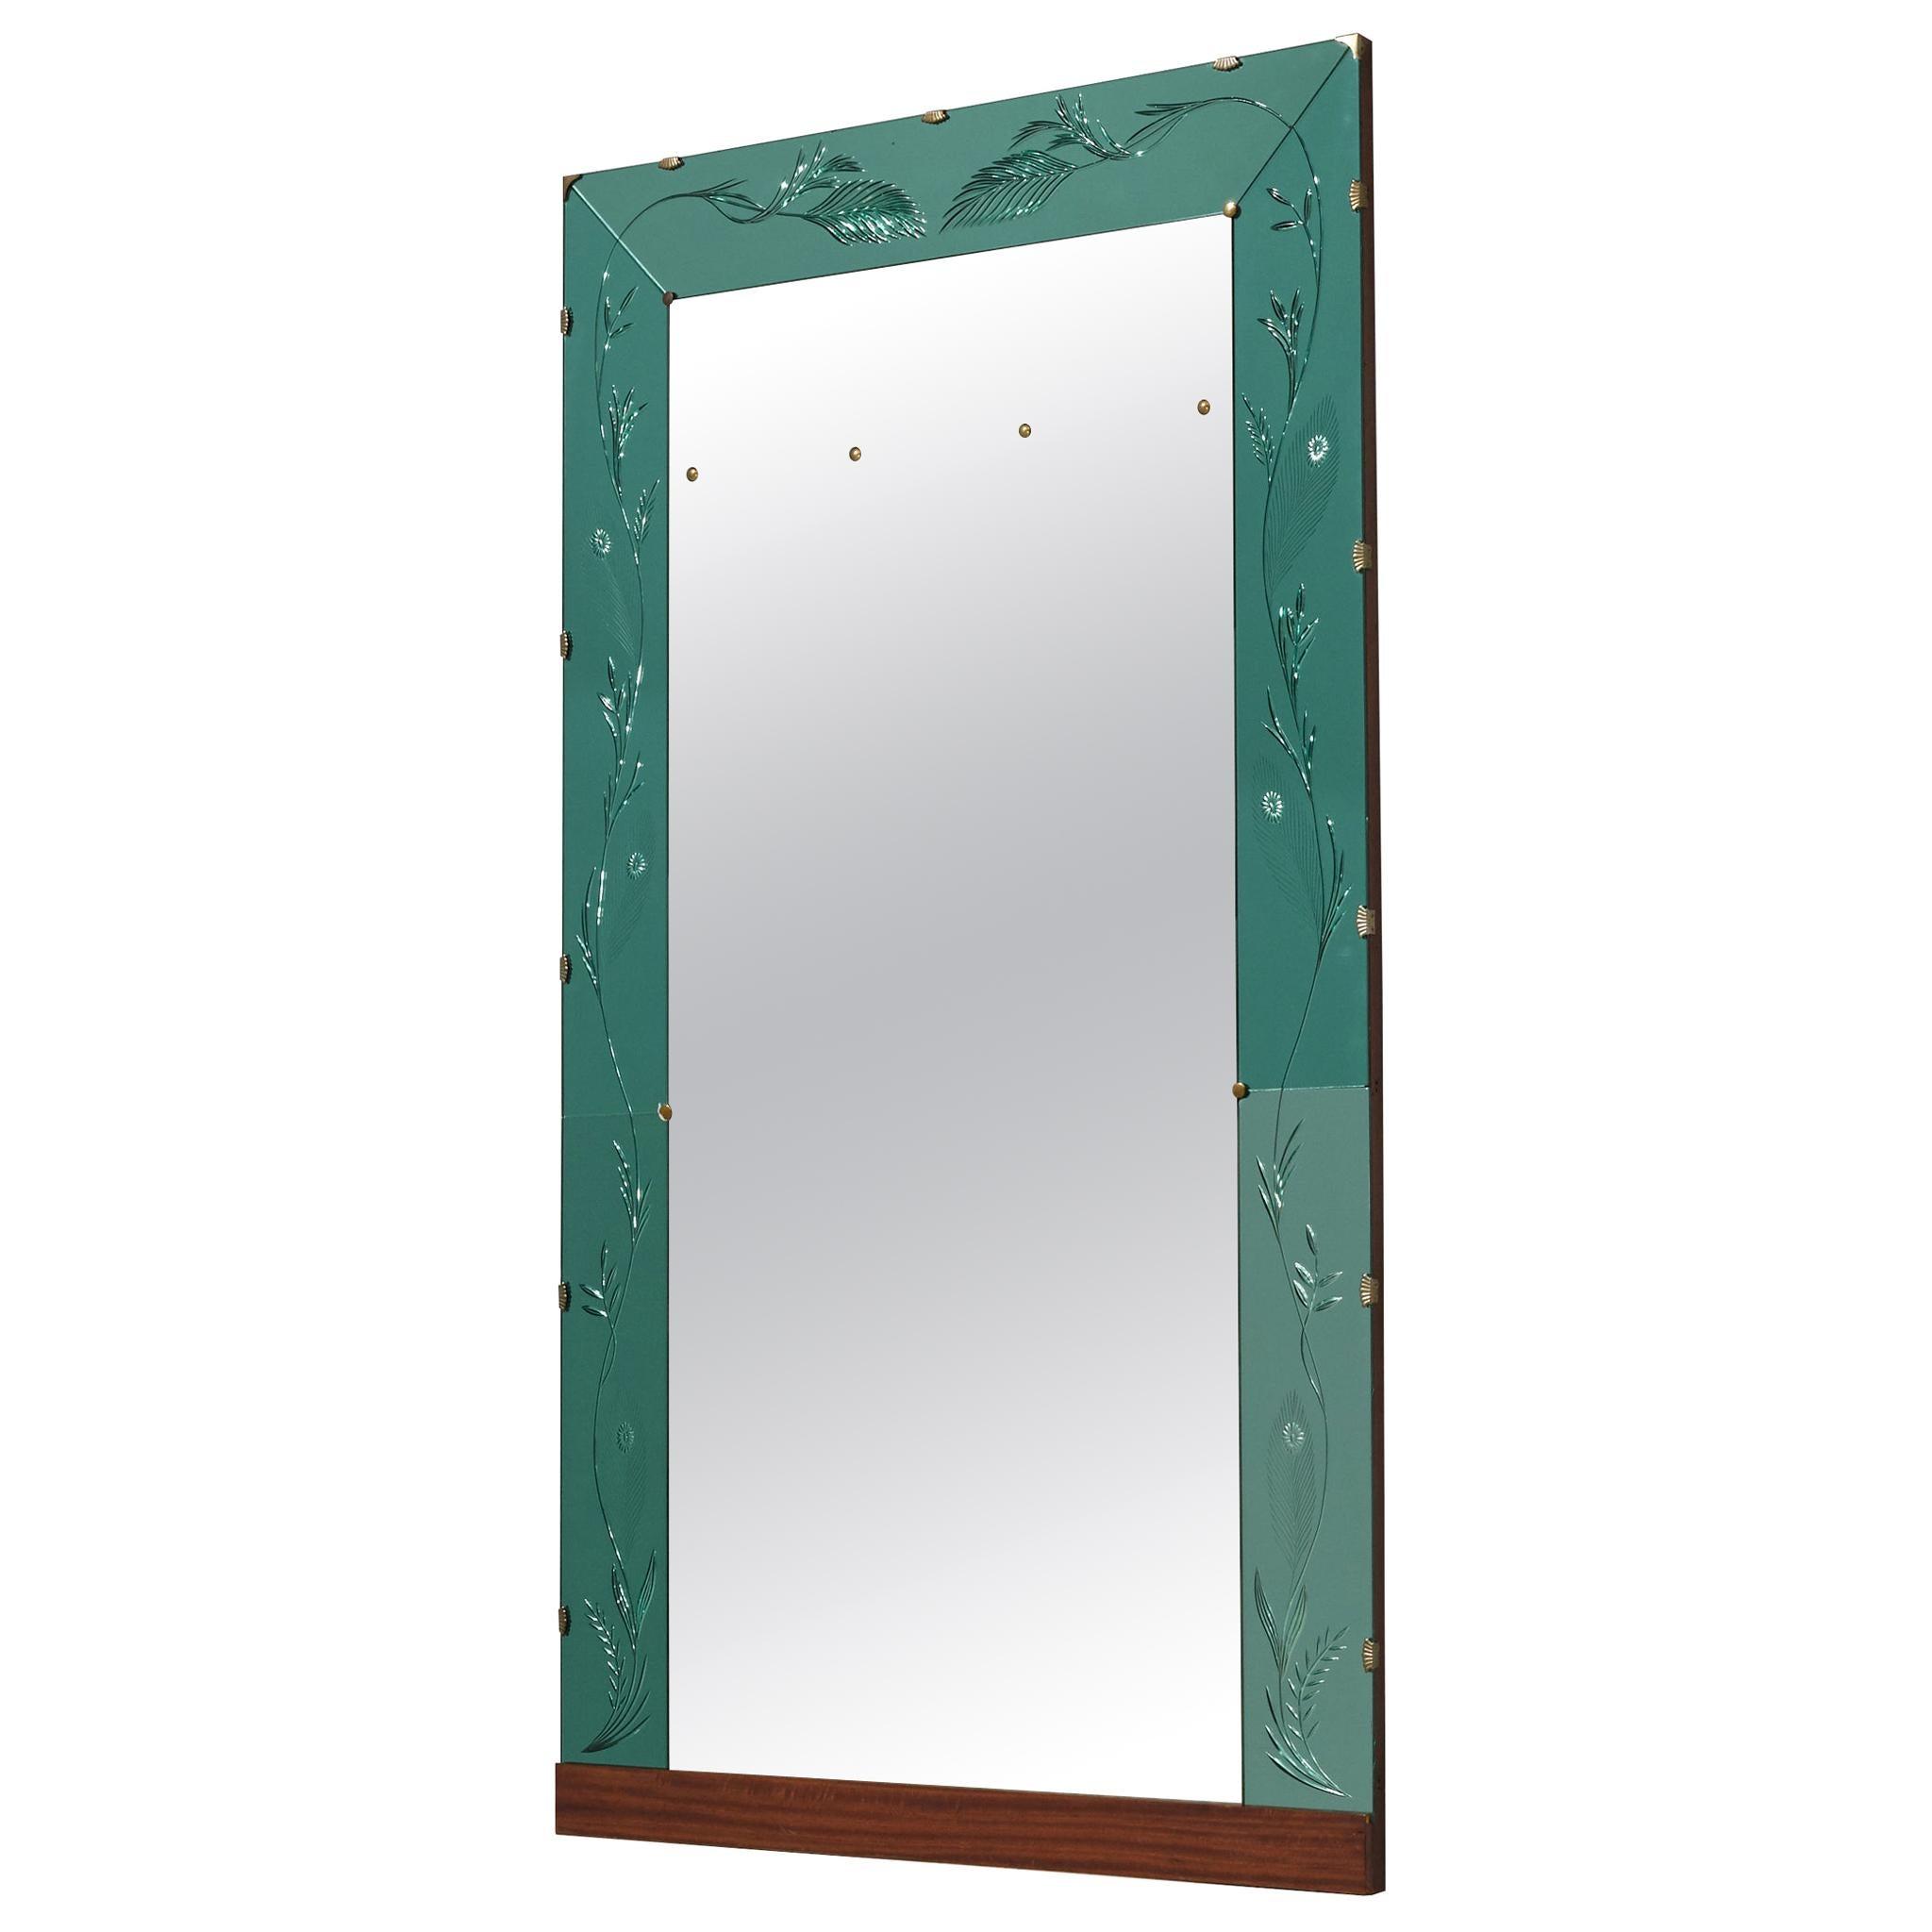 Italian Wall Mirror with Green Ledge, 1950s